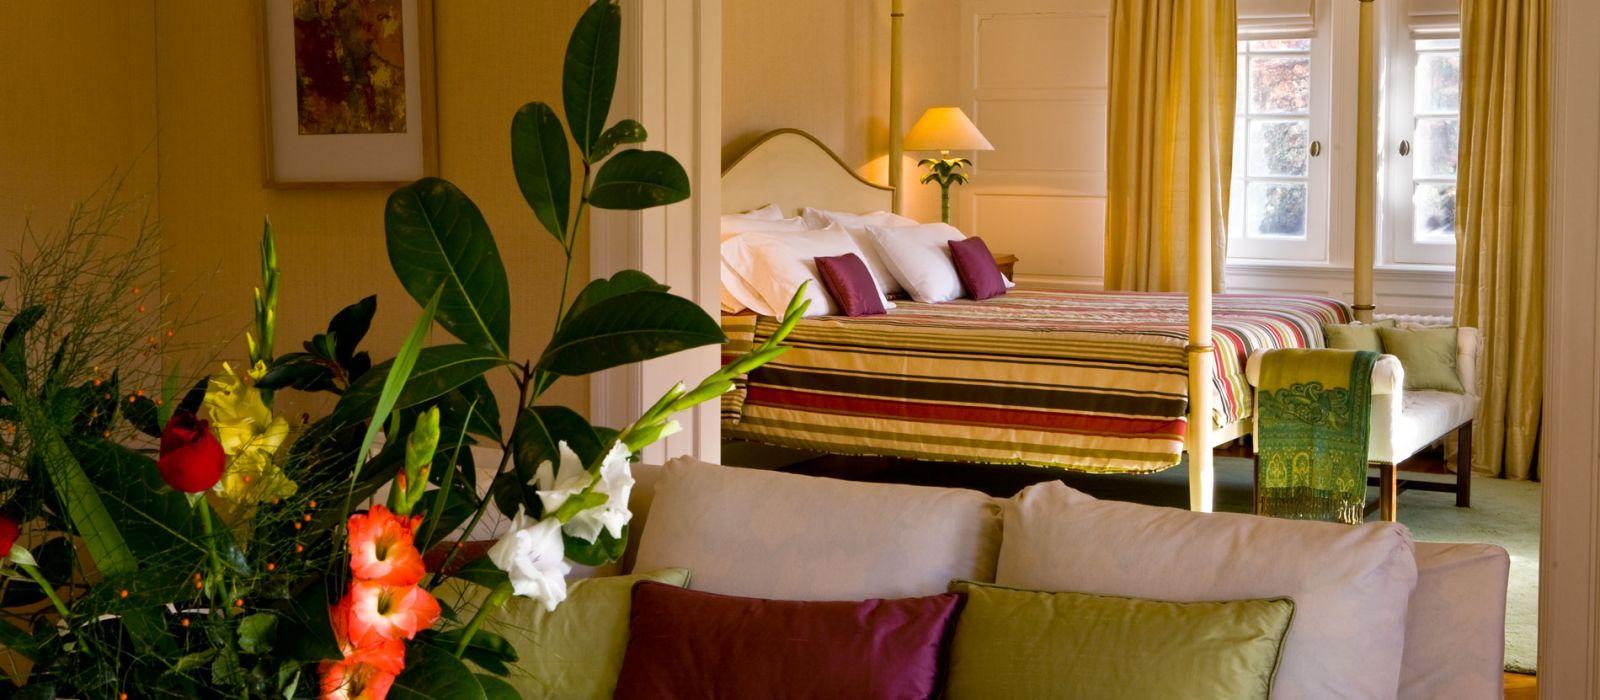 Hotel Estancia Villa Maria Argentina